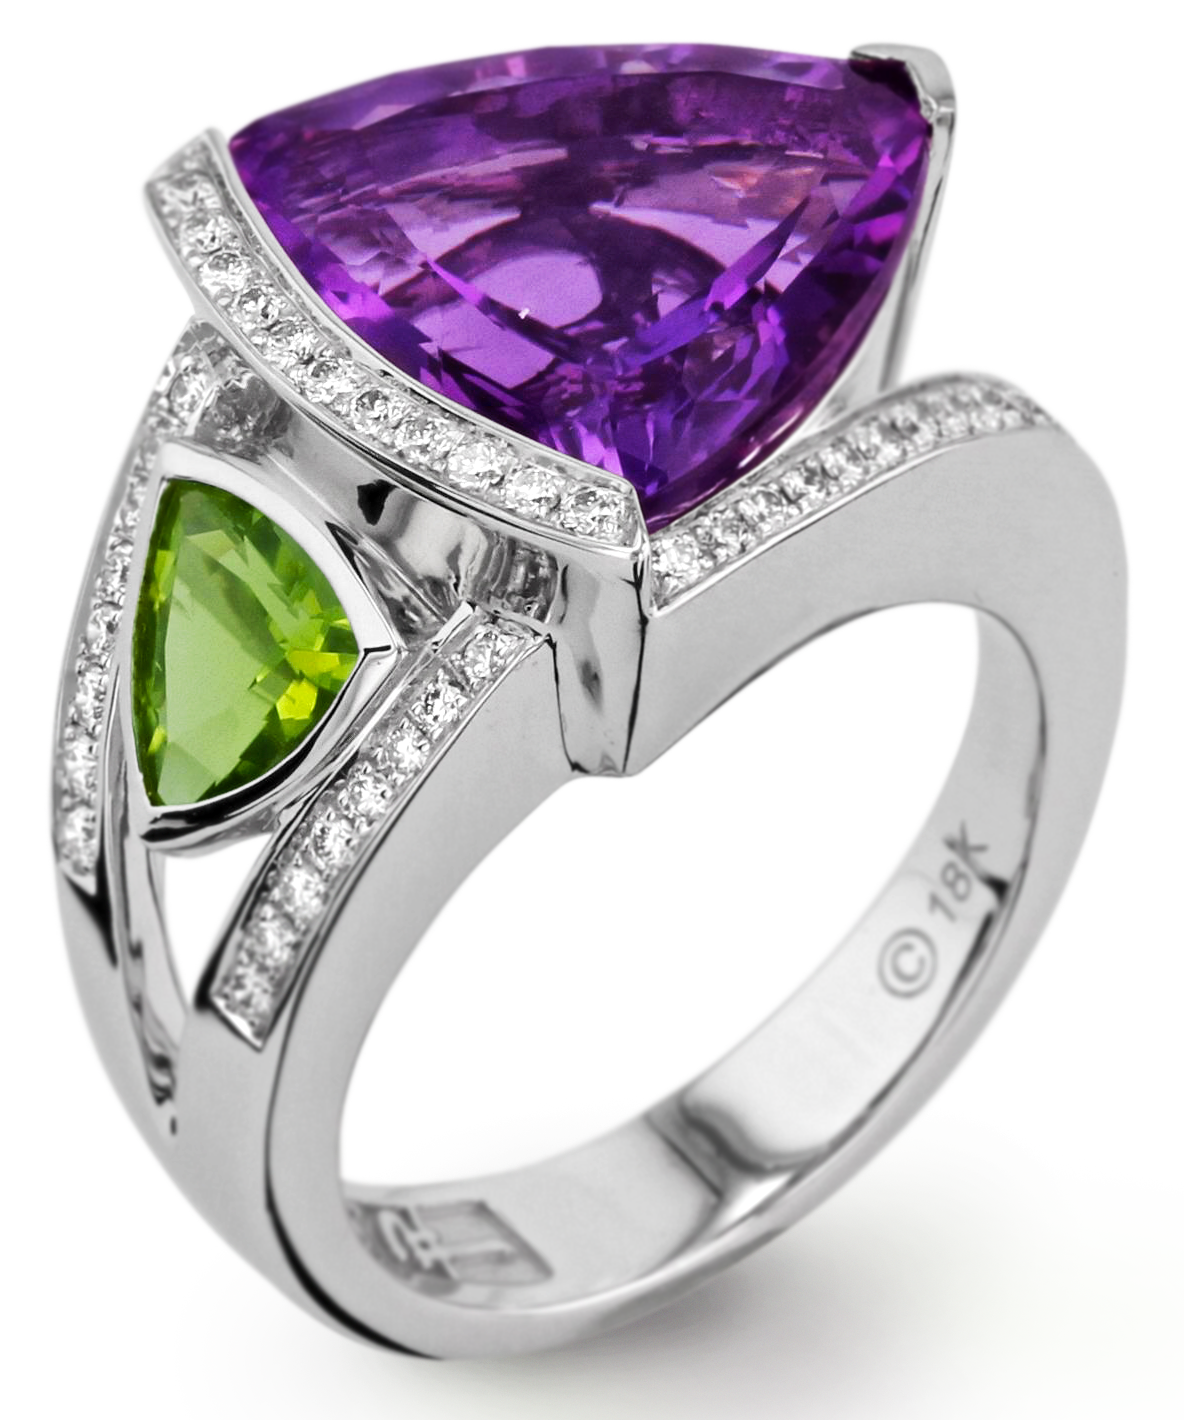 Best Ring Over ($5,000) – 2019 Winners